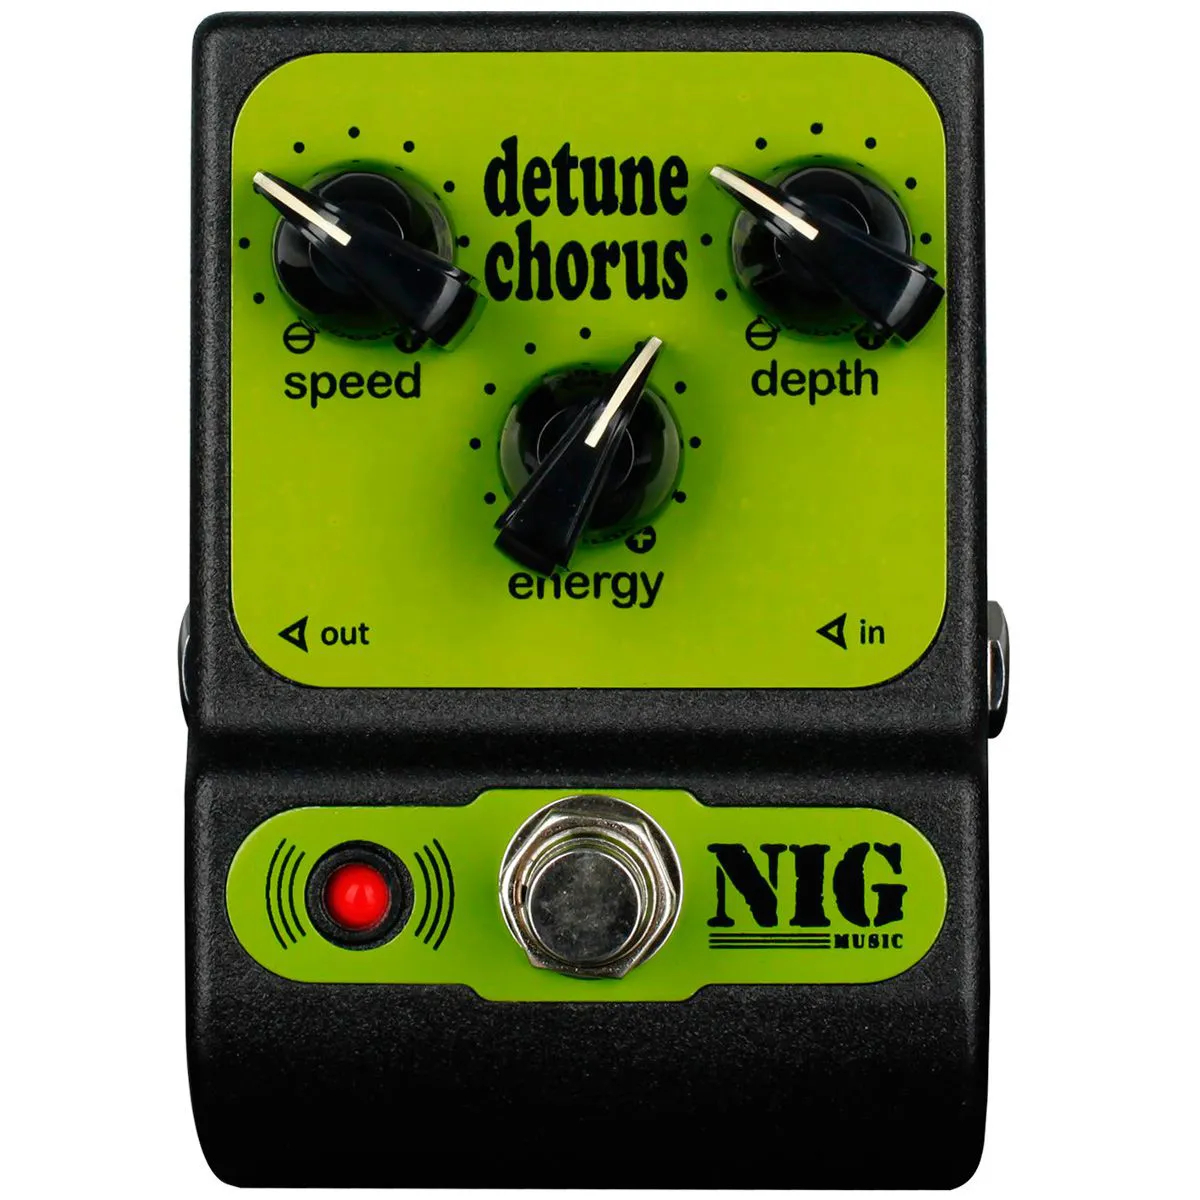 Pedal Nig Pocket Detune Chorus PCH 9V True Bypass